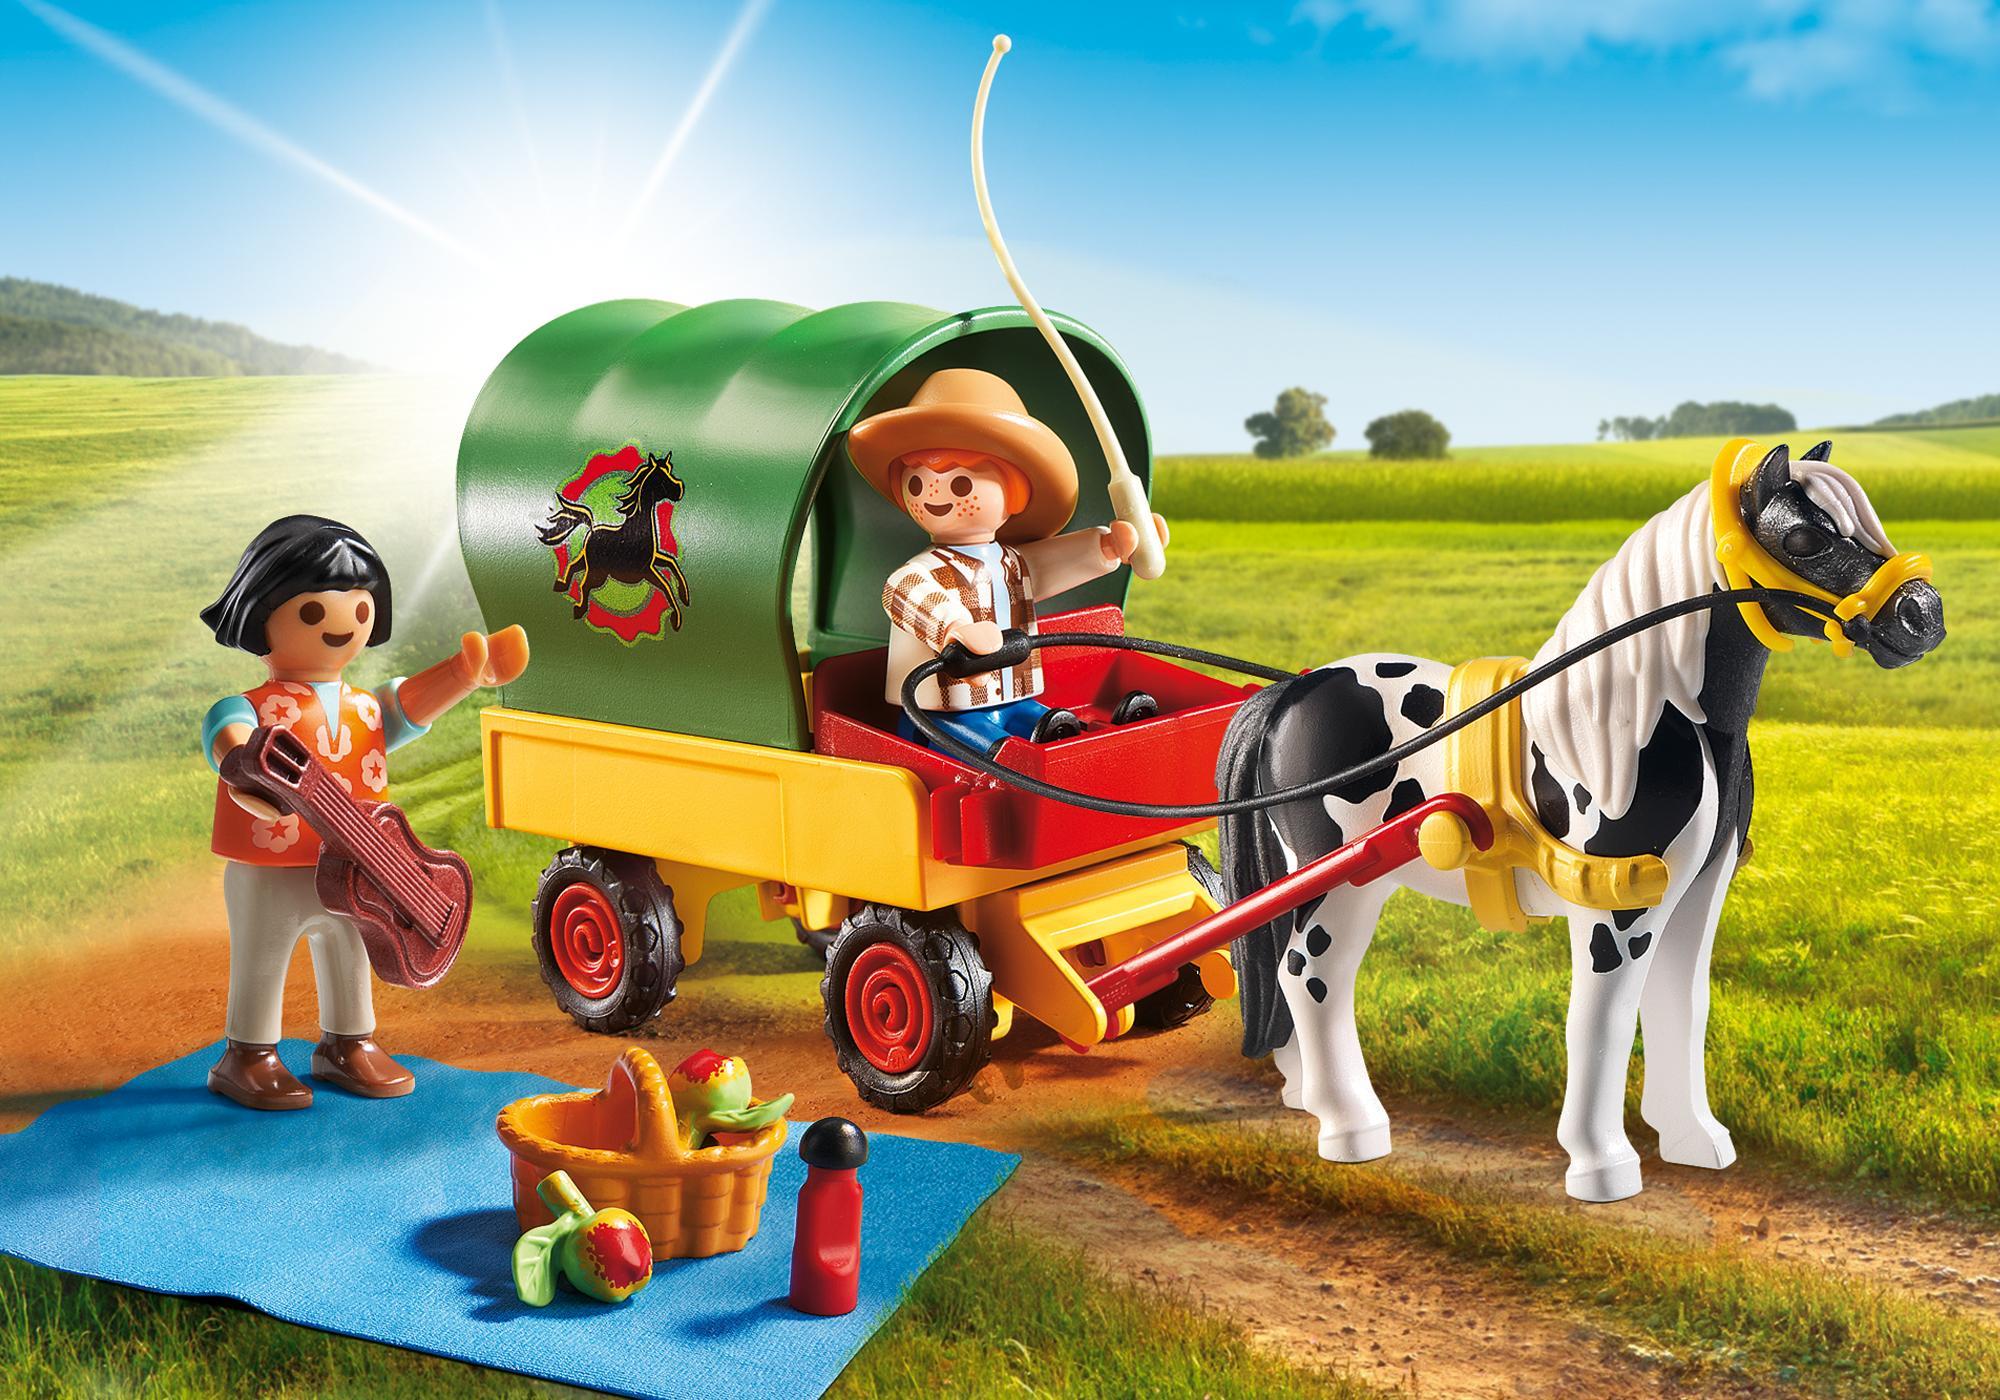 http://media.playmobil.com/i/playmobil/6948_product_detail